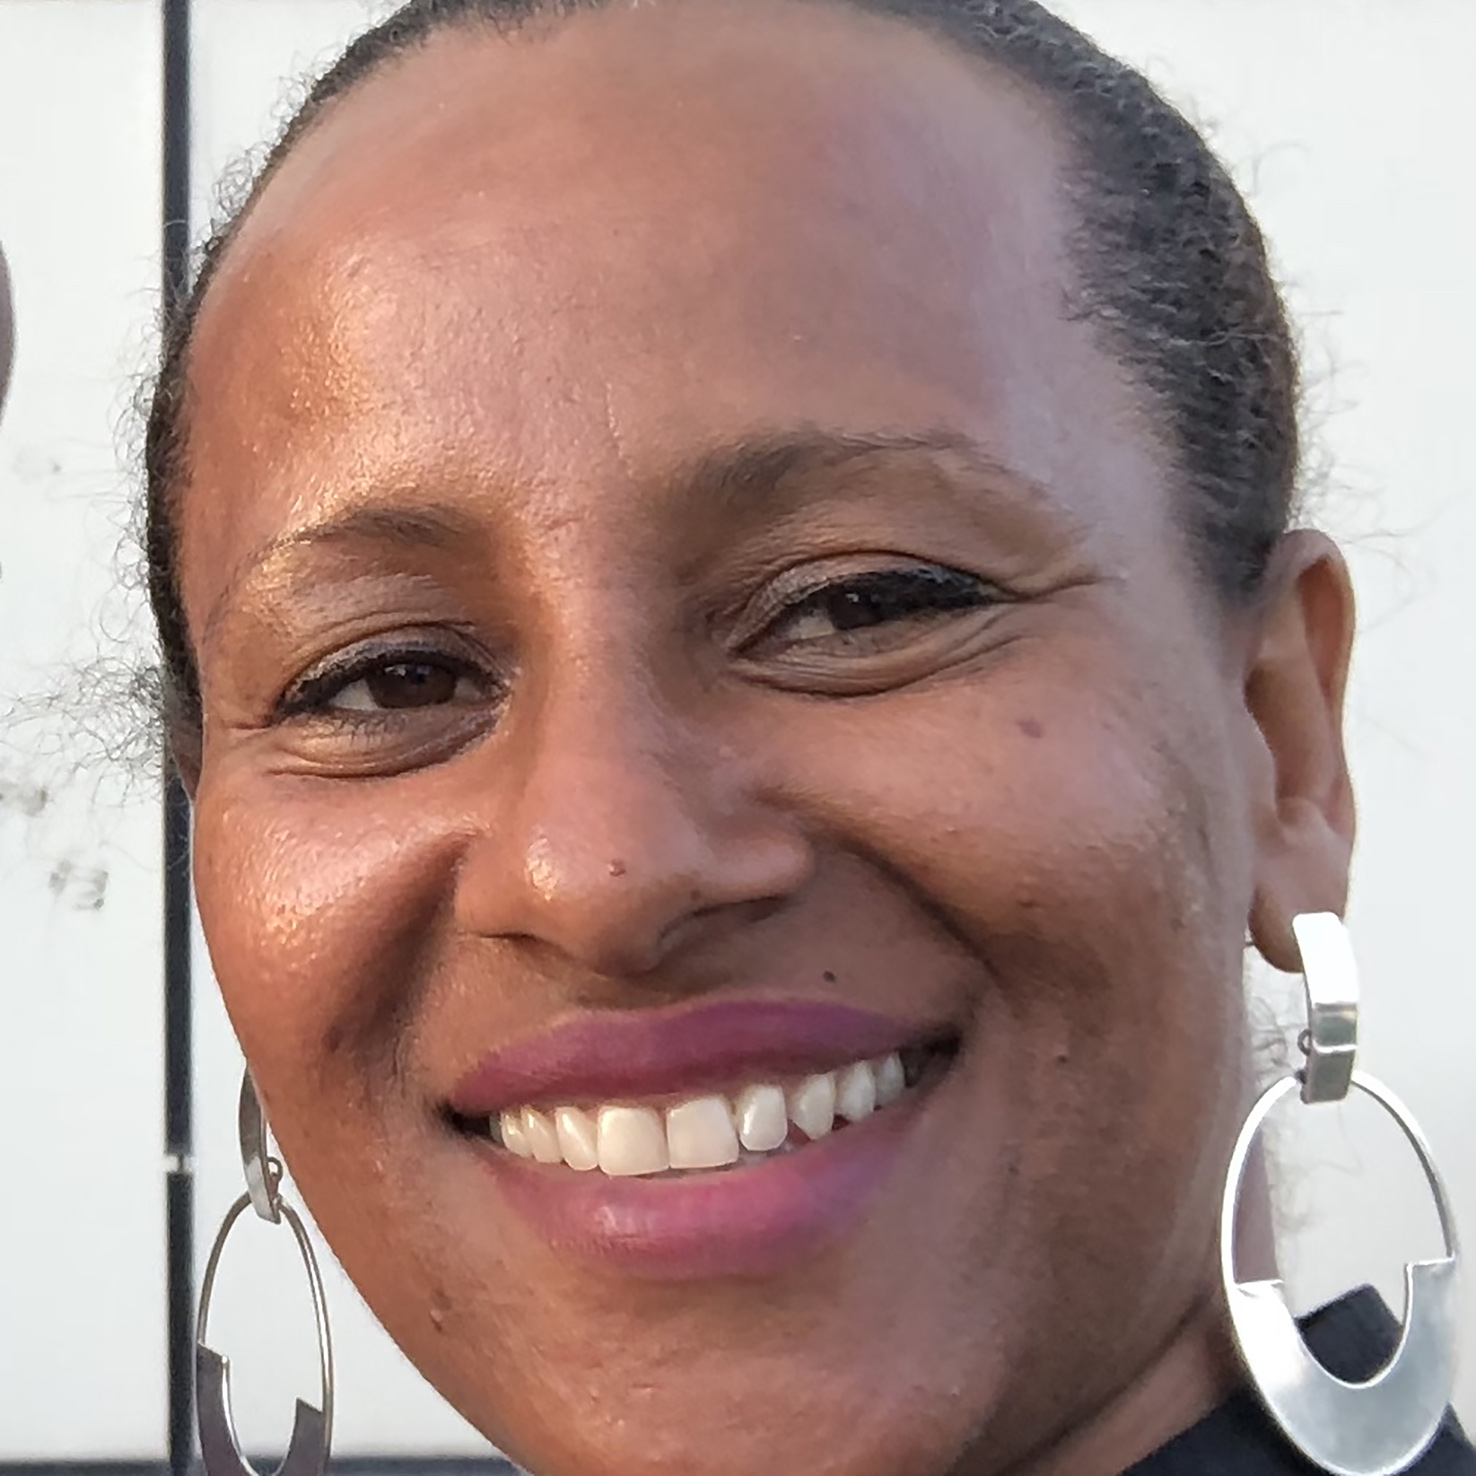 Mahlet Teklemariam